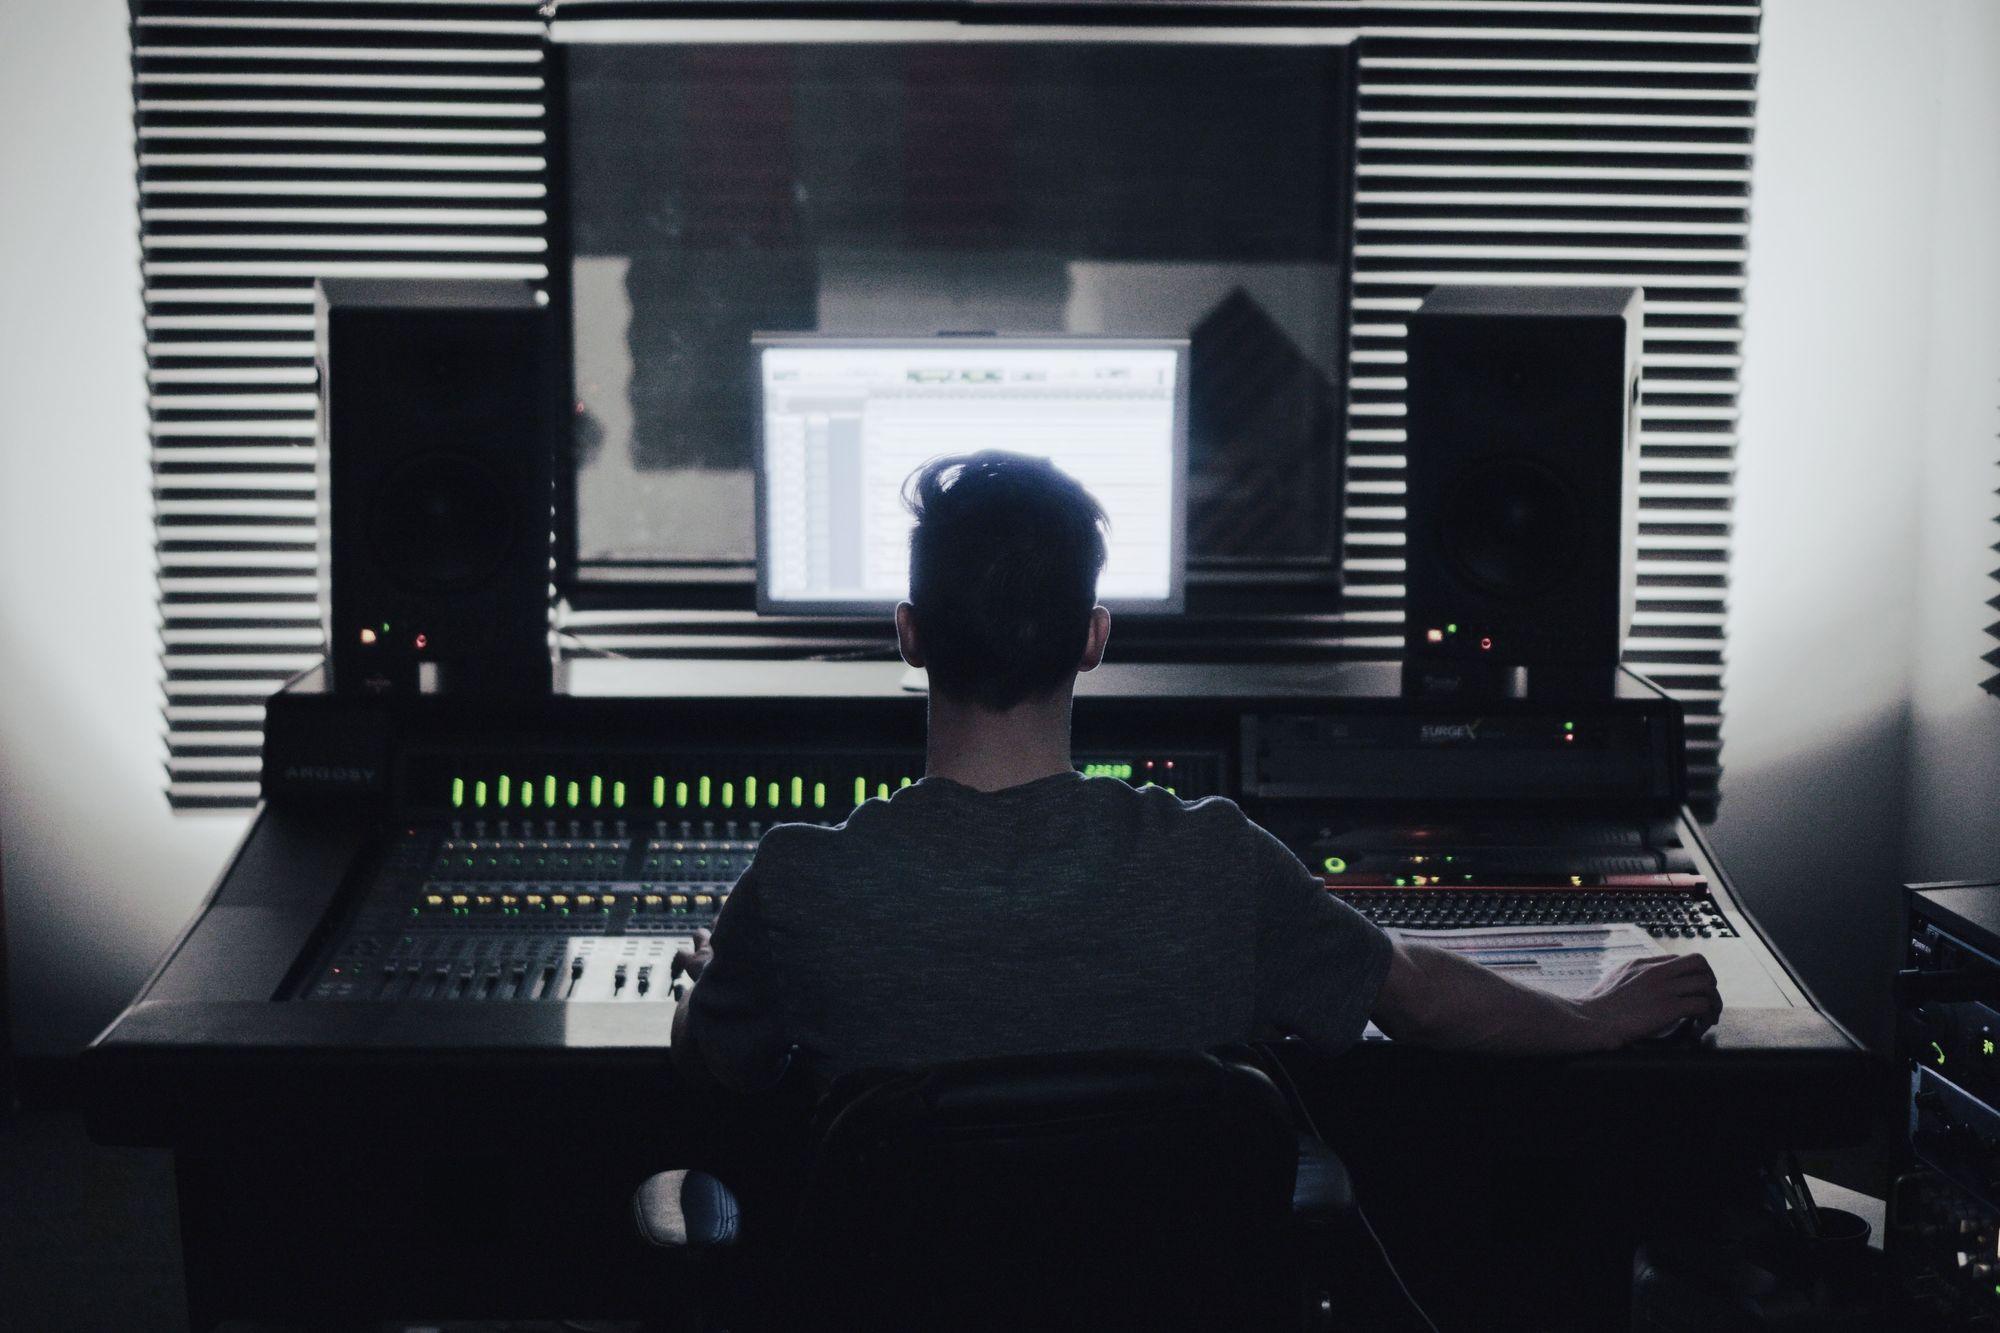 Crucial sound design elements